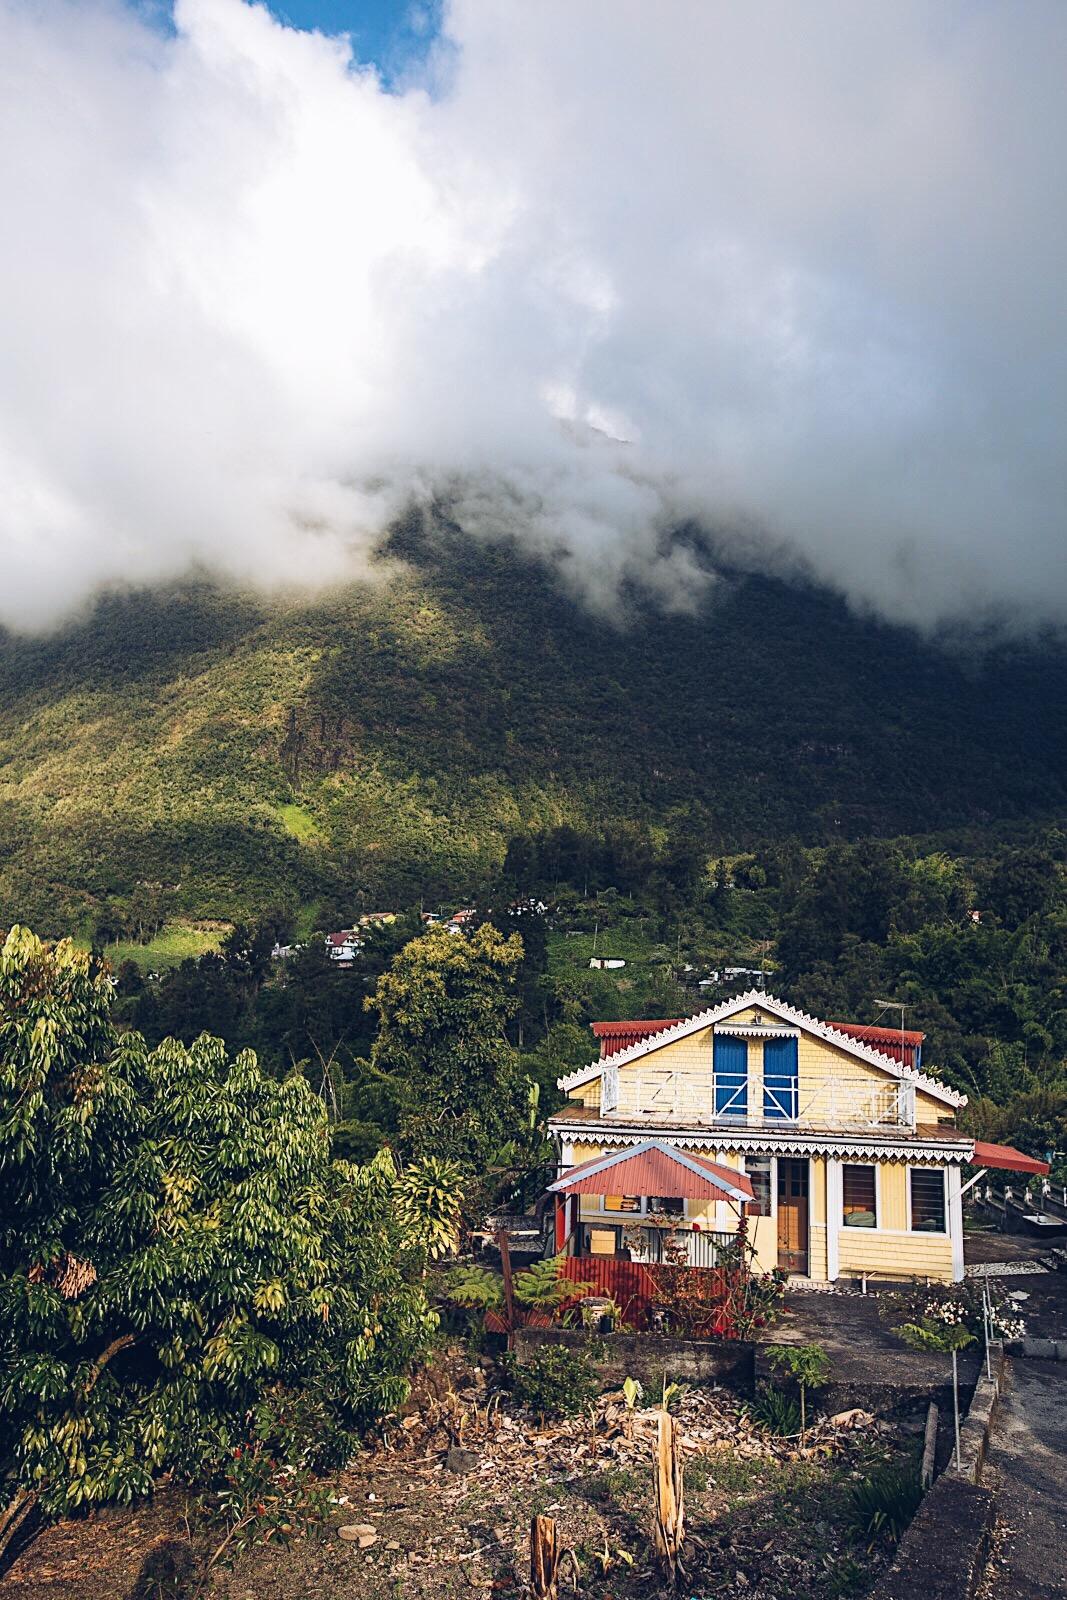 Hell-Bourg, Salazie La Réunion